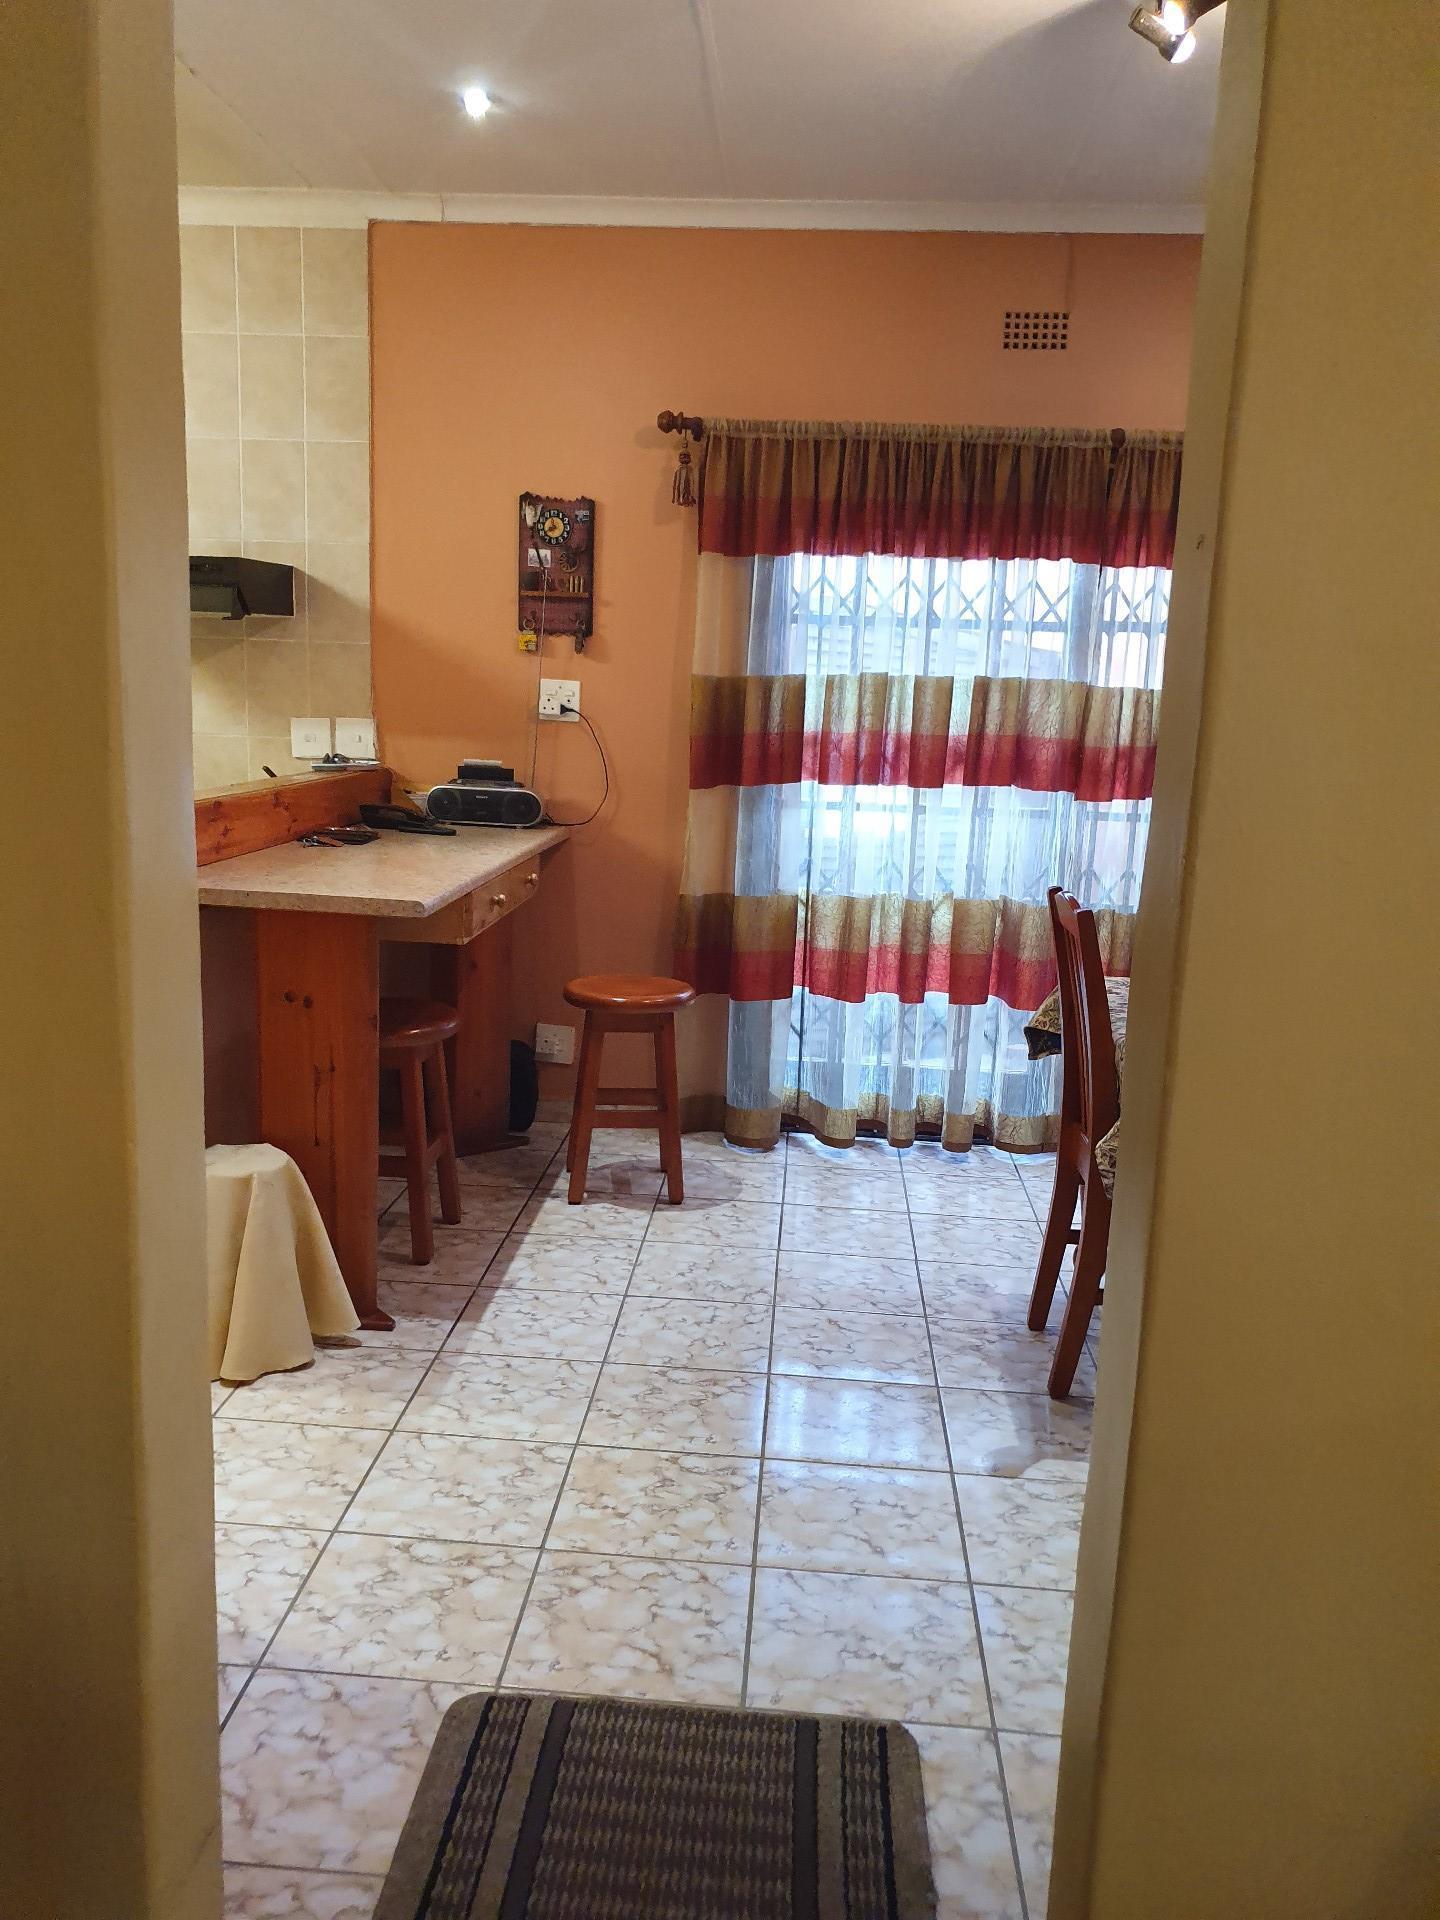 4 Bedroom House For Sale in Kriel